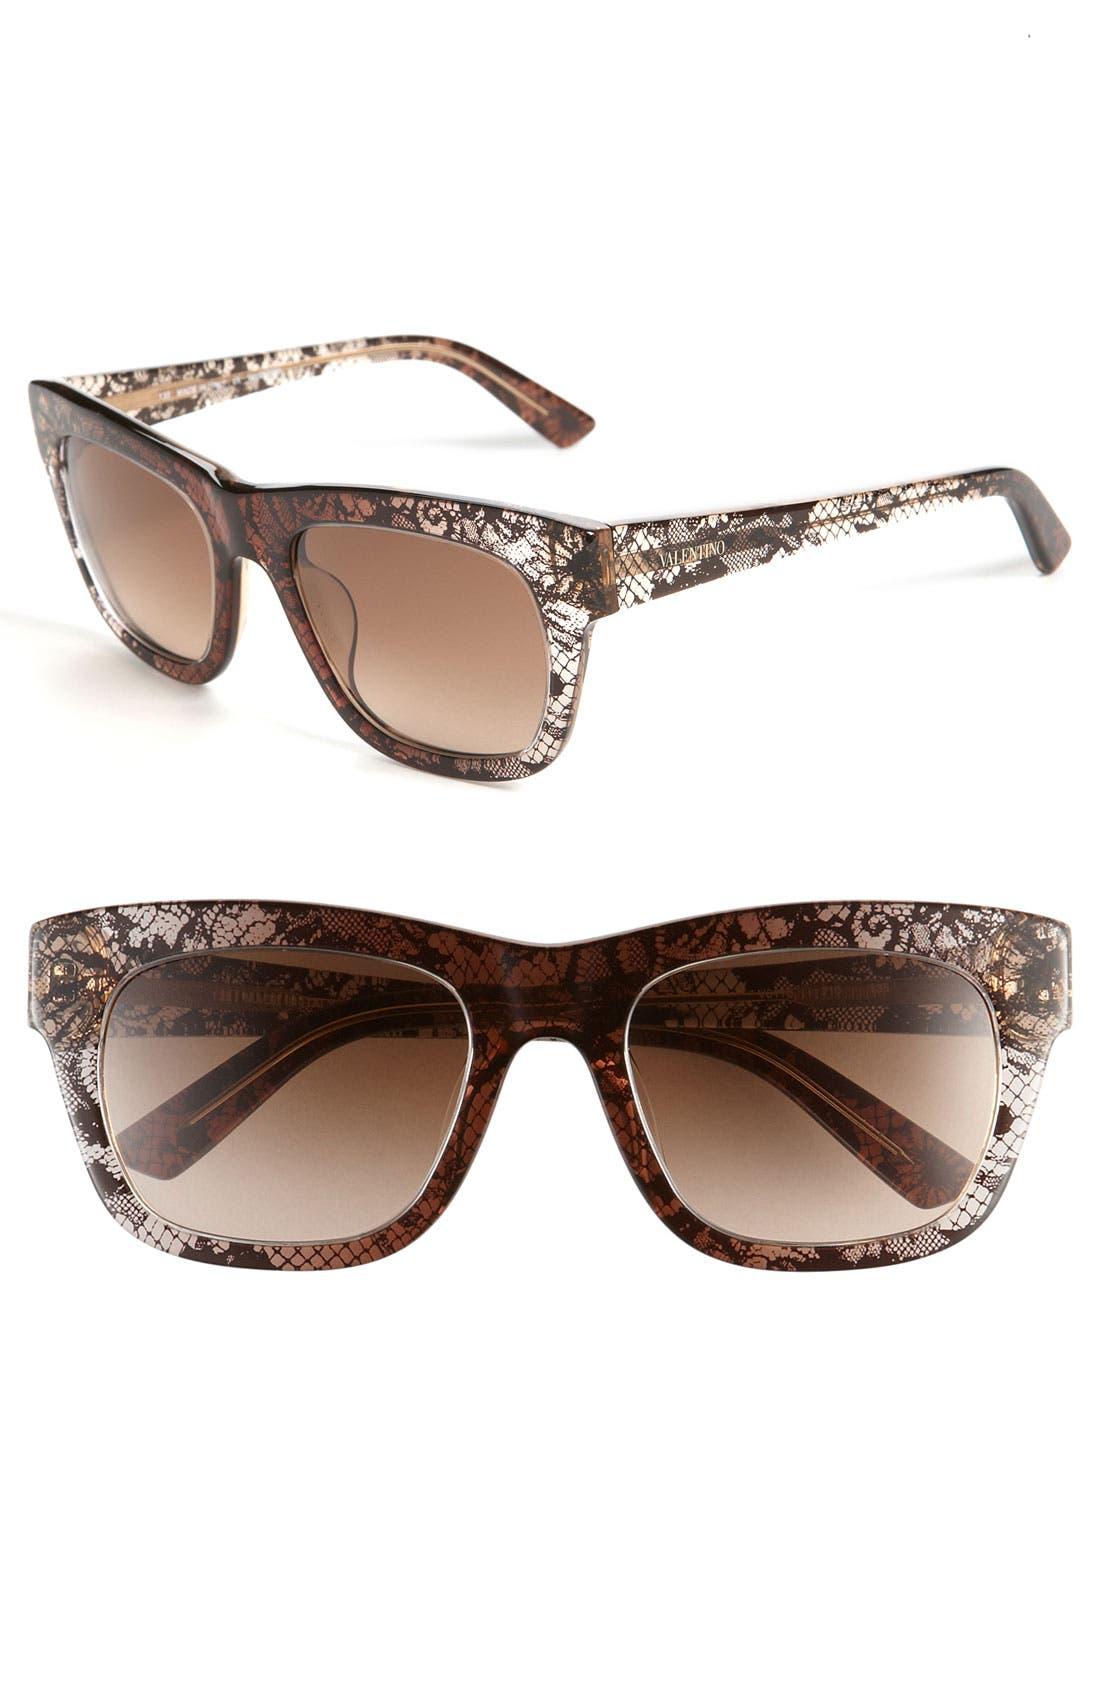 Main Image - Valentino Sunglasses